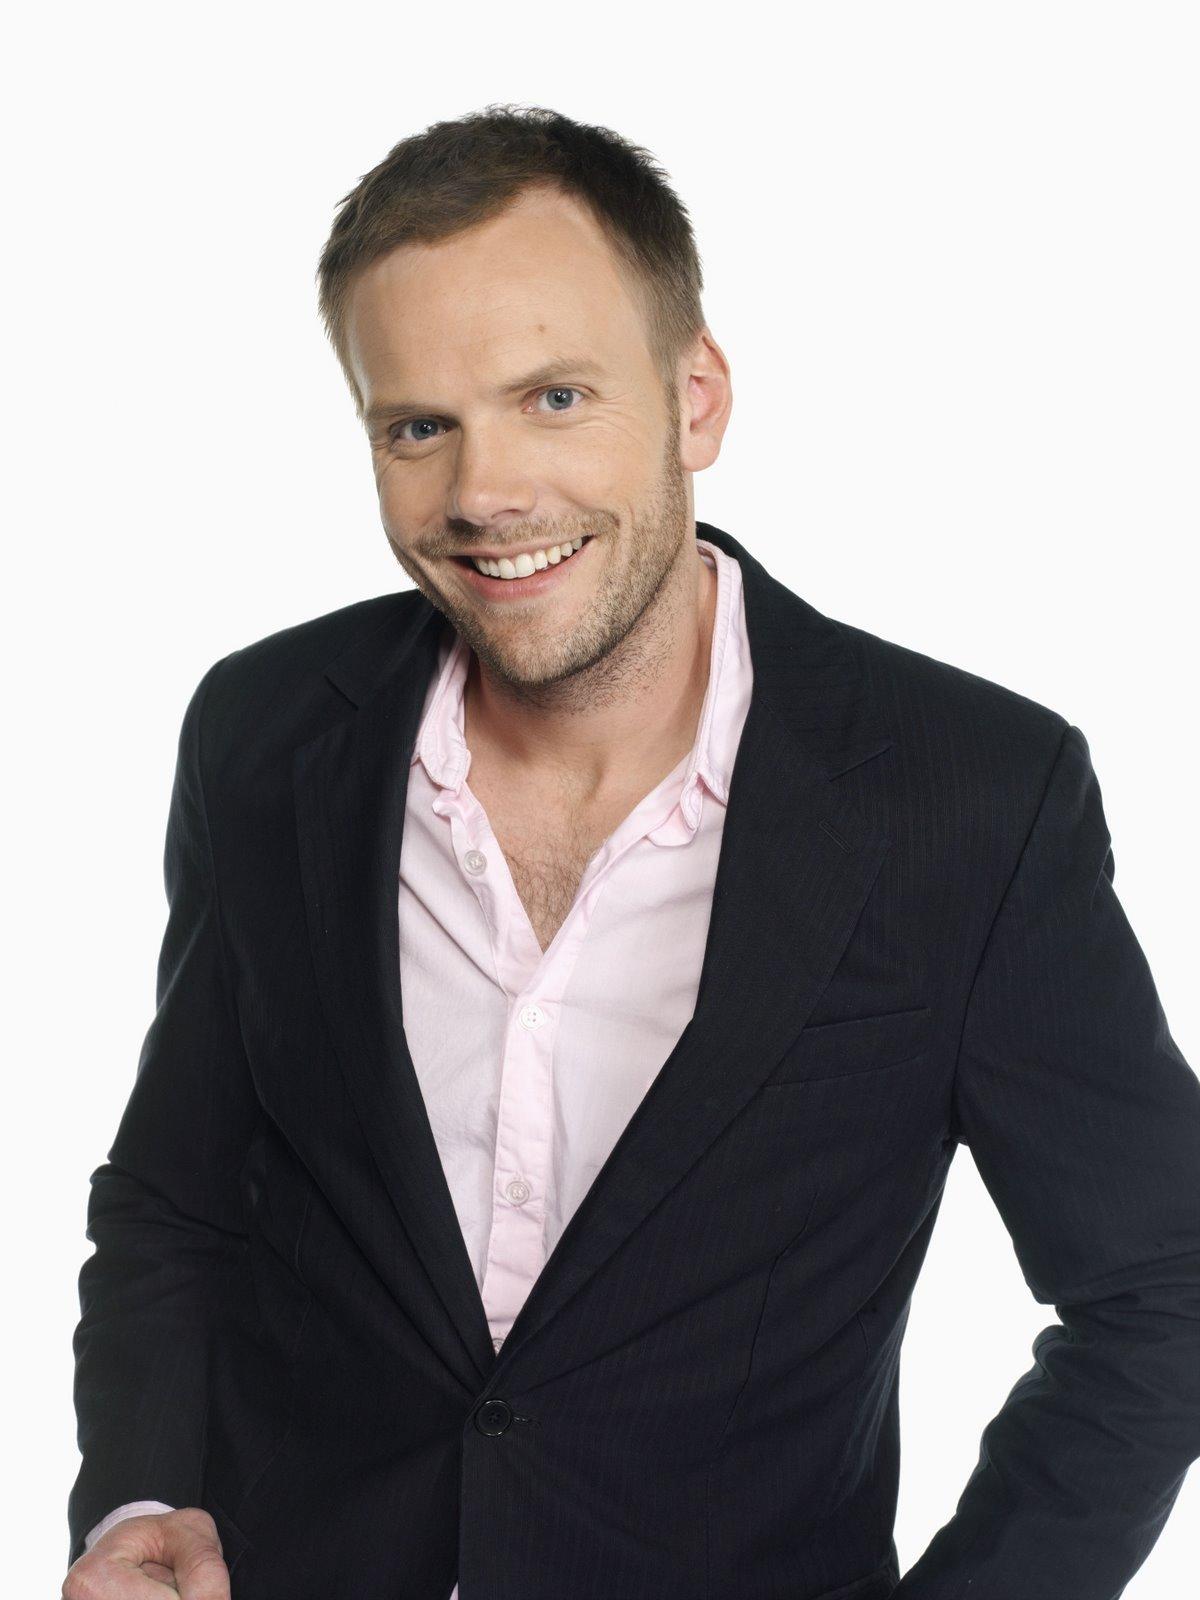 Joel Mchale Show 2011